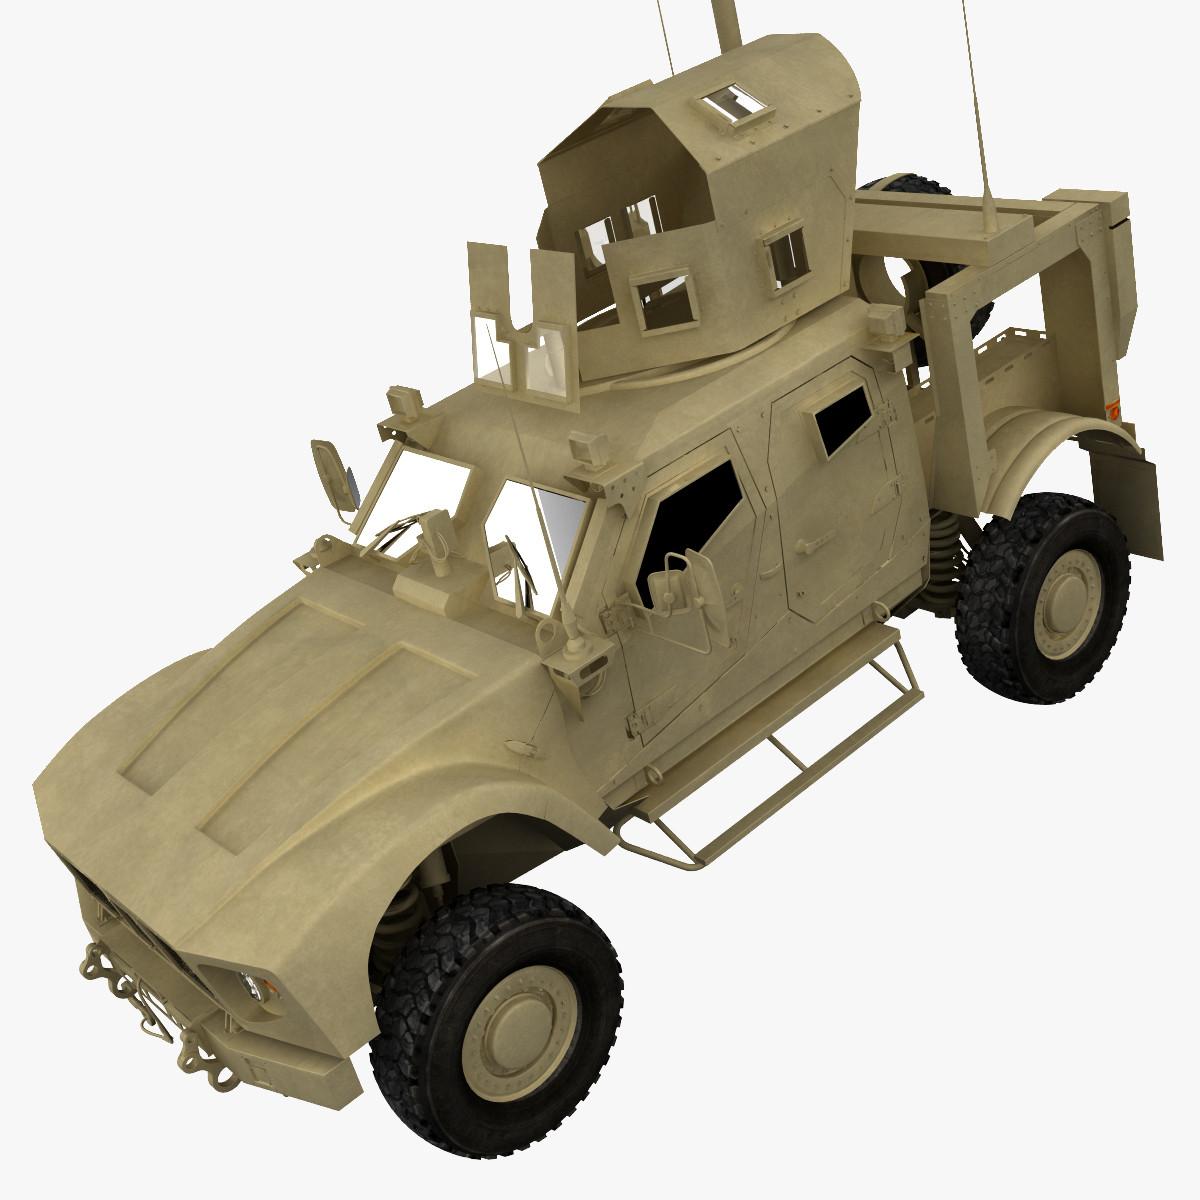 3d model oshkosh m-atv v2